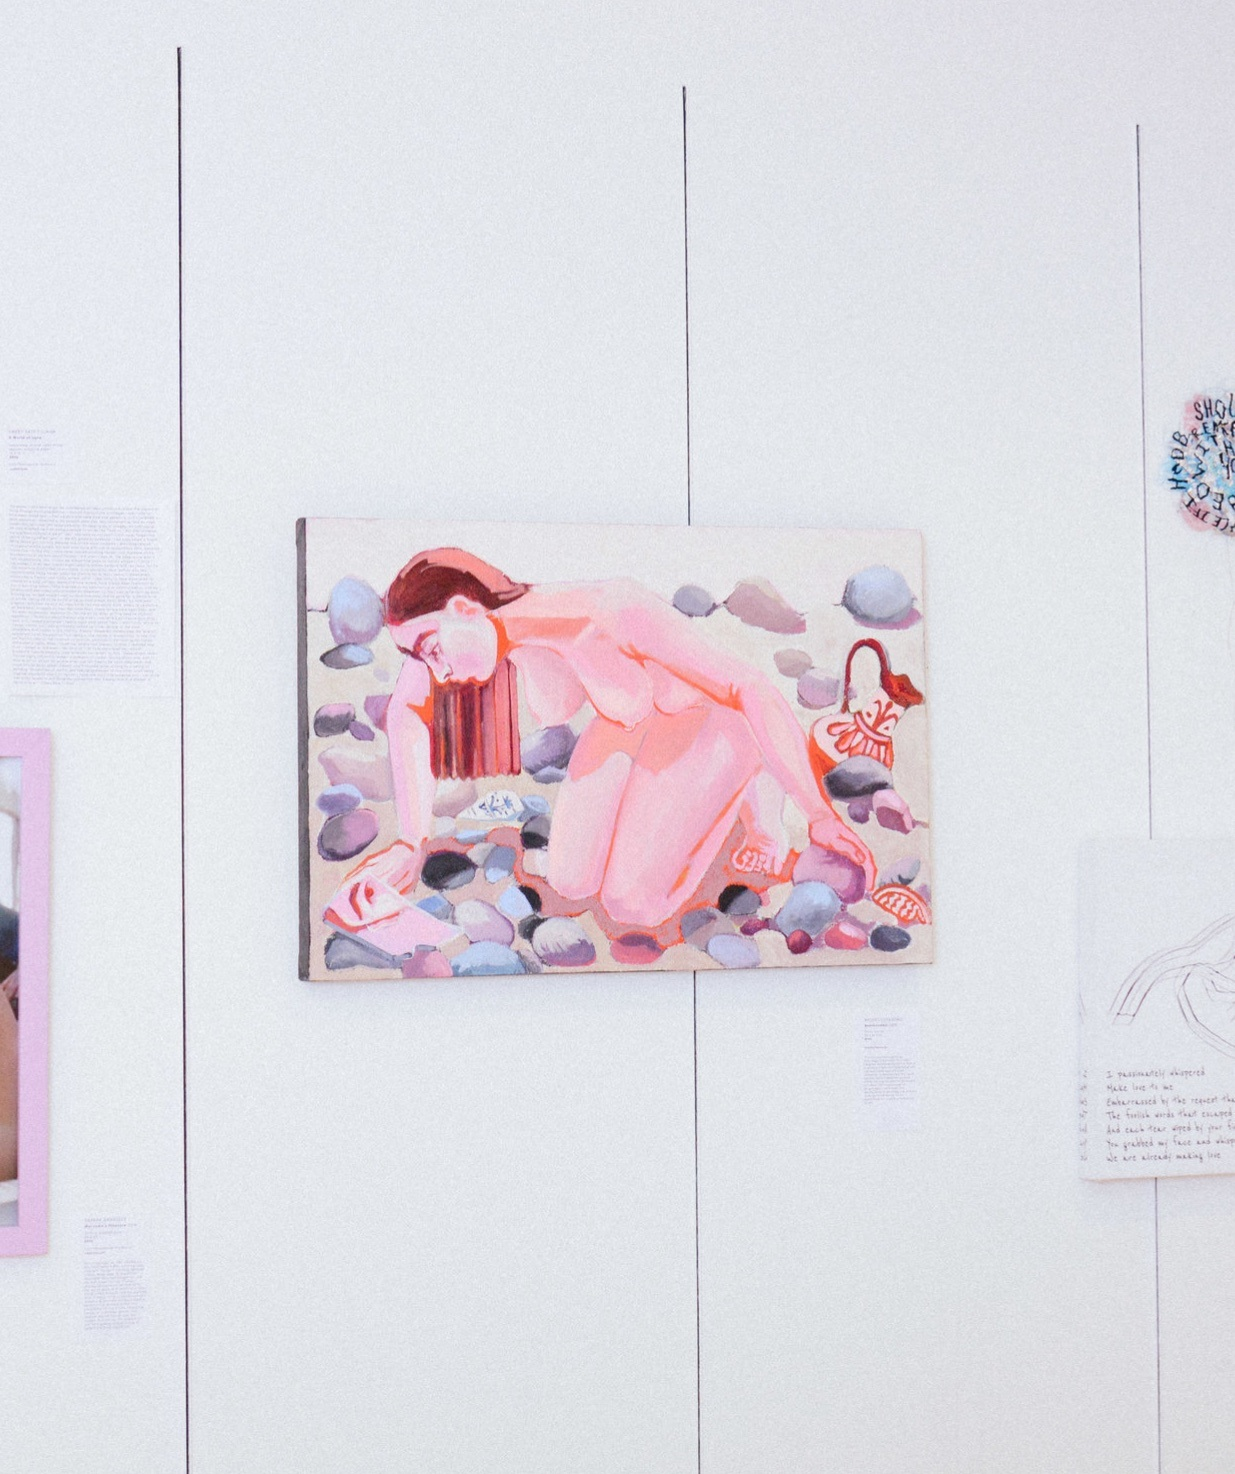 Rachel Loyacono, Beachcomber, 2018, Oil on canvas, 30.5x20in. $725